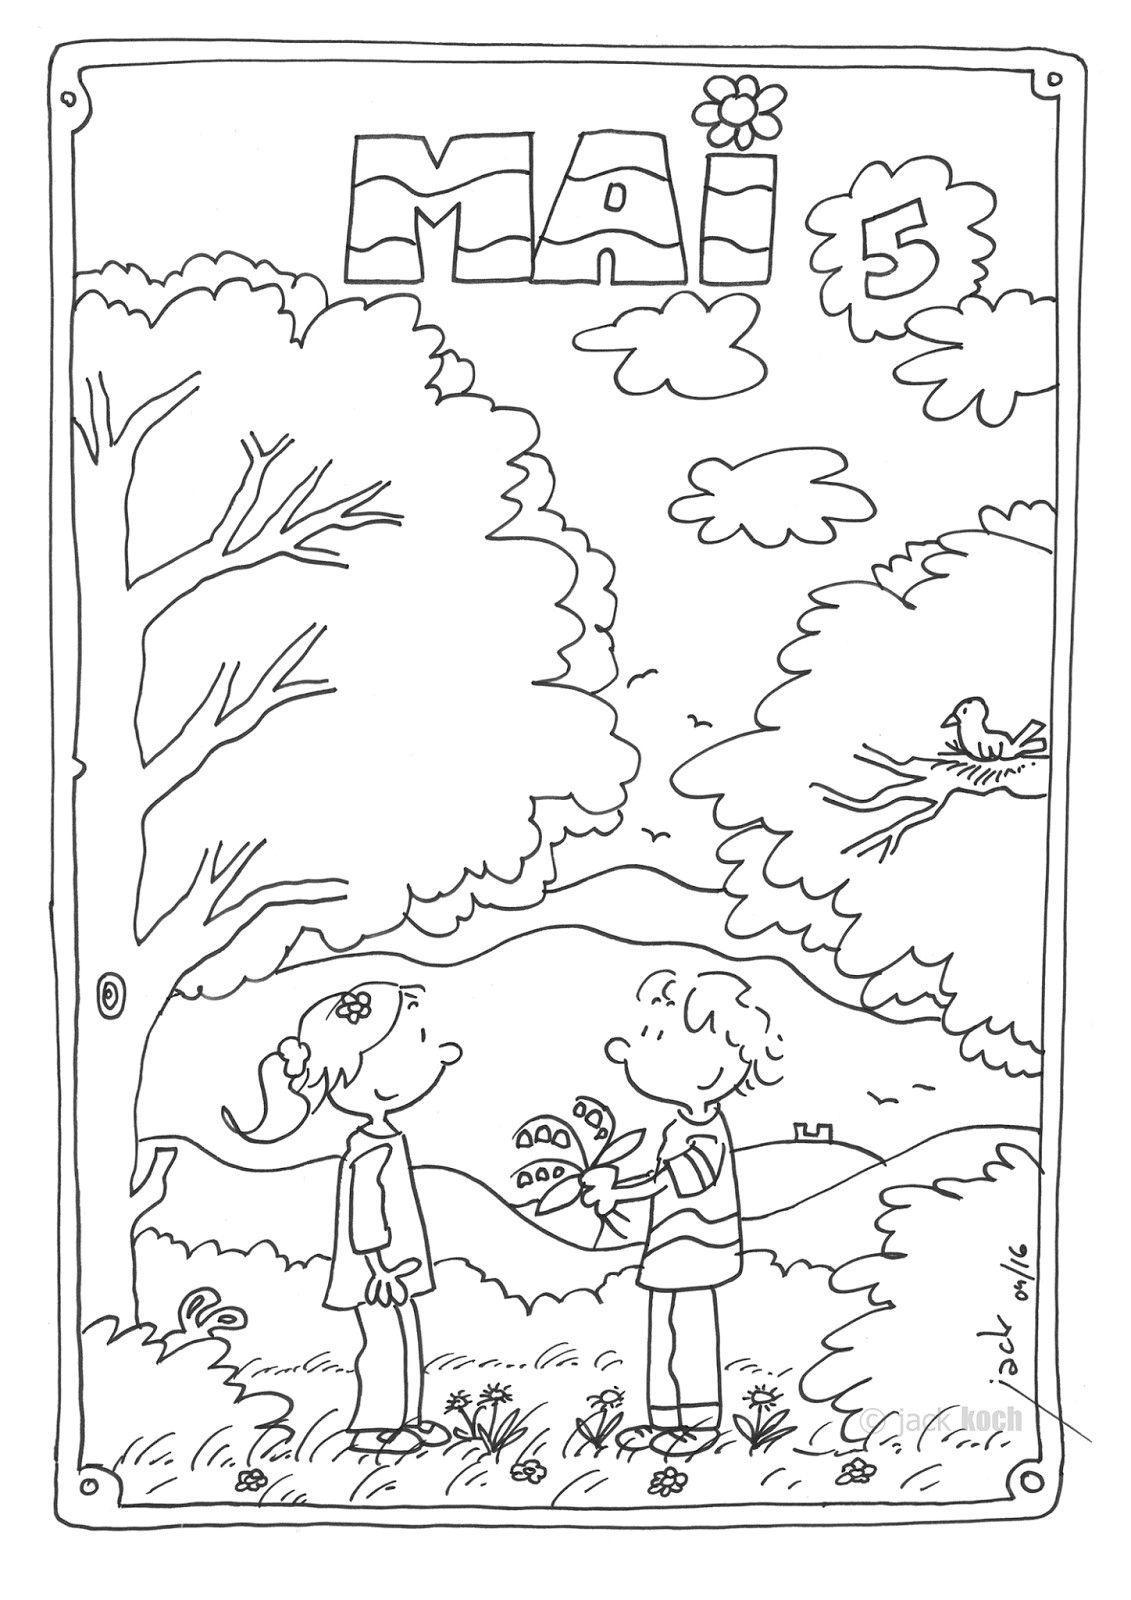 Coloriage Mois Mai Maternelle | Coloriage, Maternelle avec Mois À Colorier Maternelle